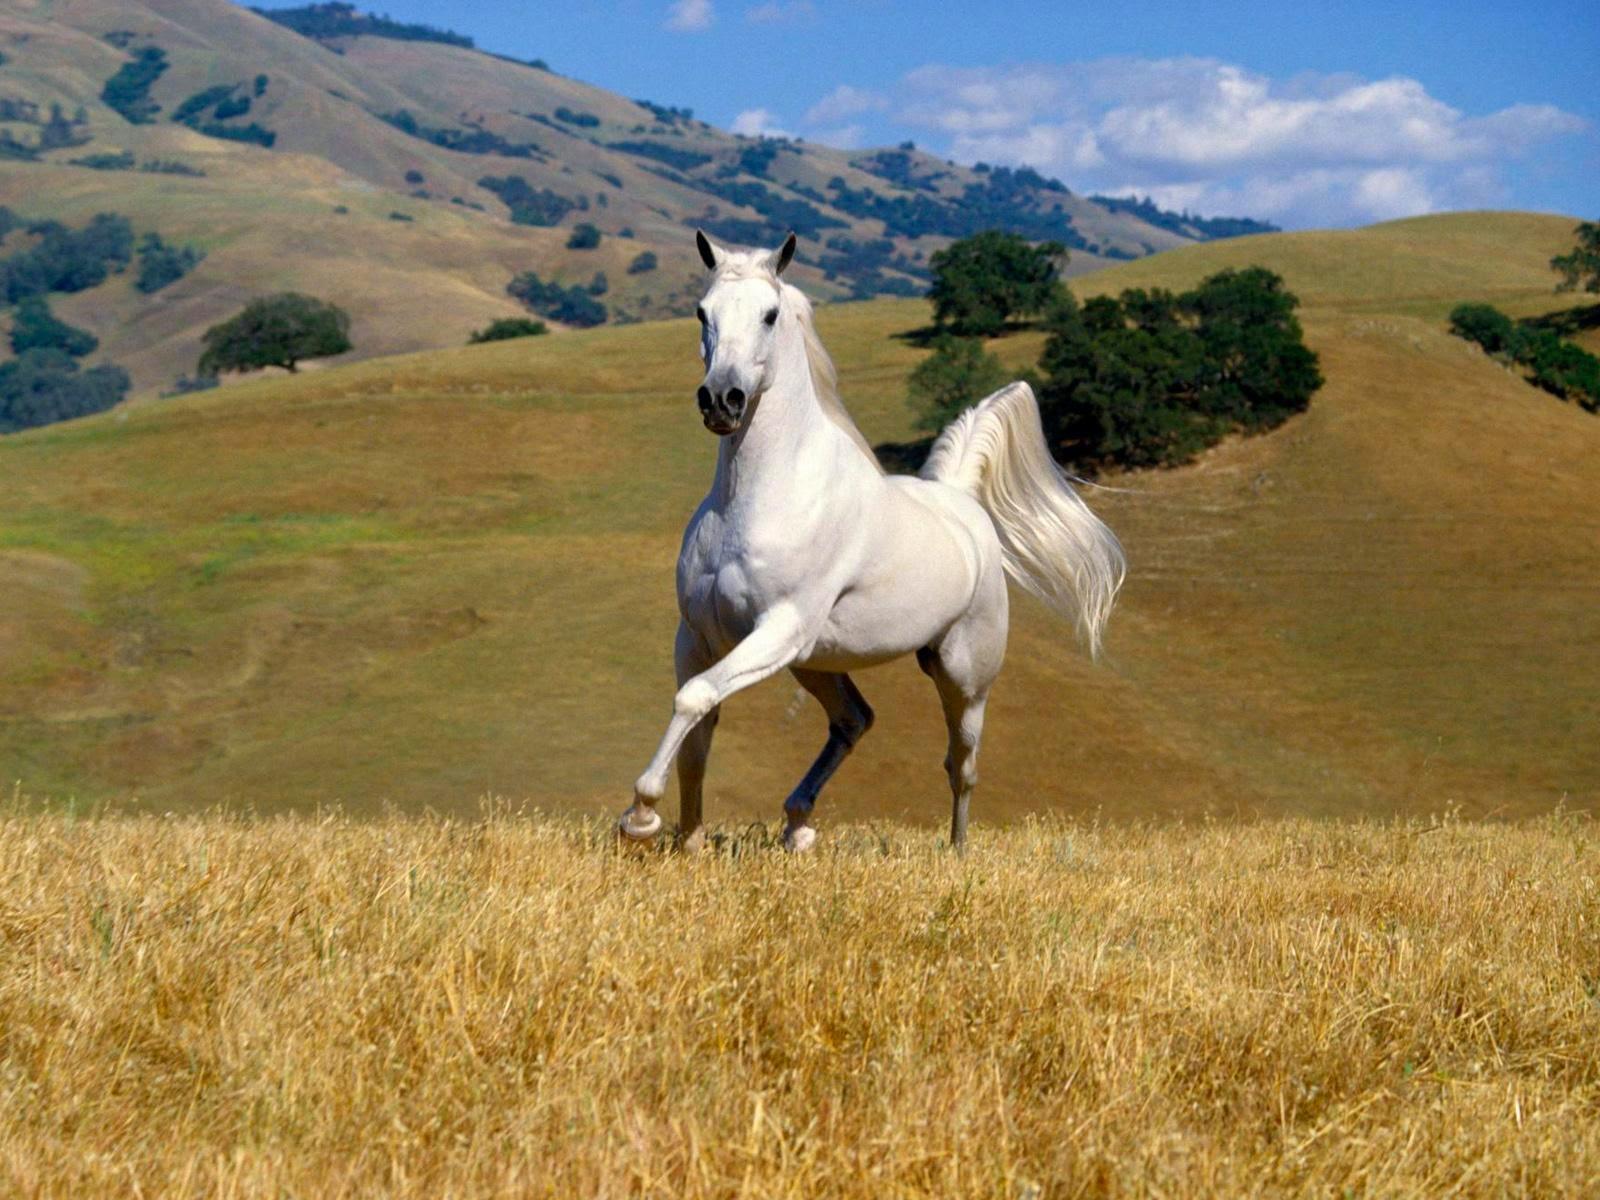 Wonderful   Wallpaper Horse Samsung Galaxy - Horse%2BHD%2BWallpapers%2B(7)  Perfect Image Reference_69532.jpg